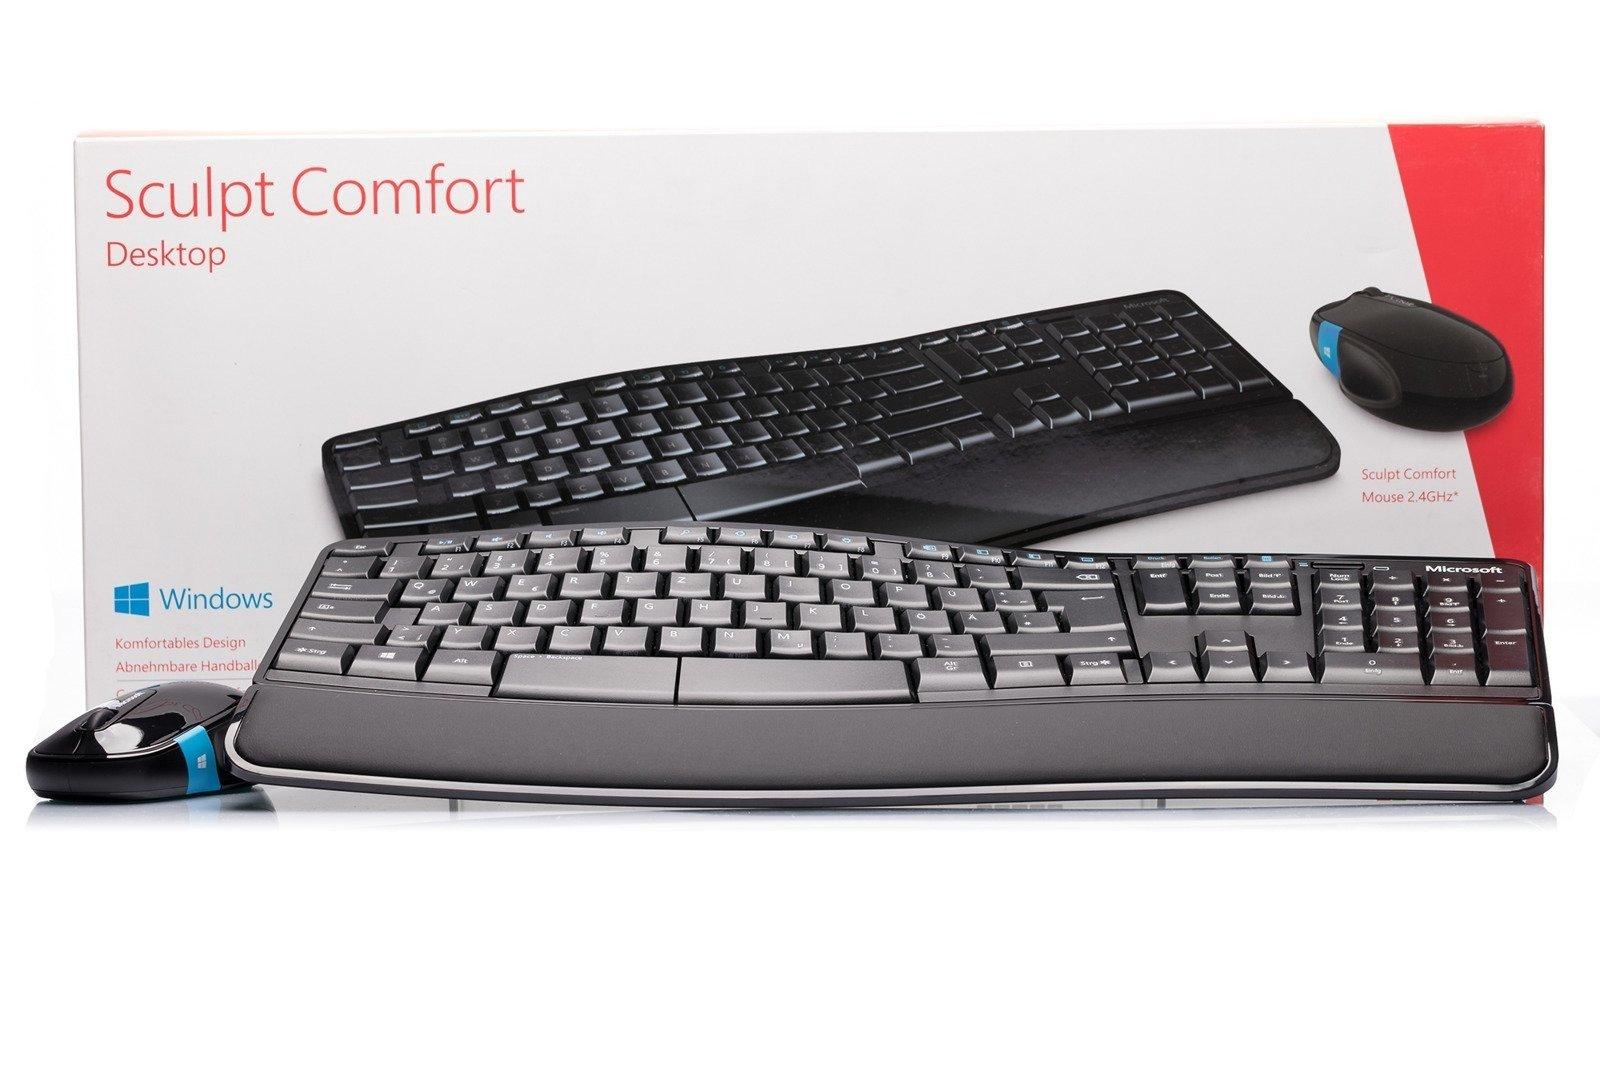 Klawiatura Microsoft Sculpt Comfort Desktop (Niemiecka)